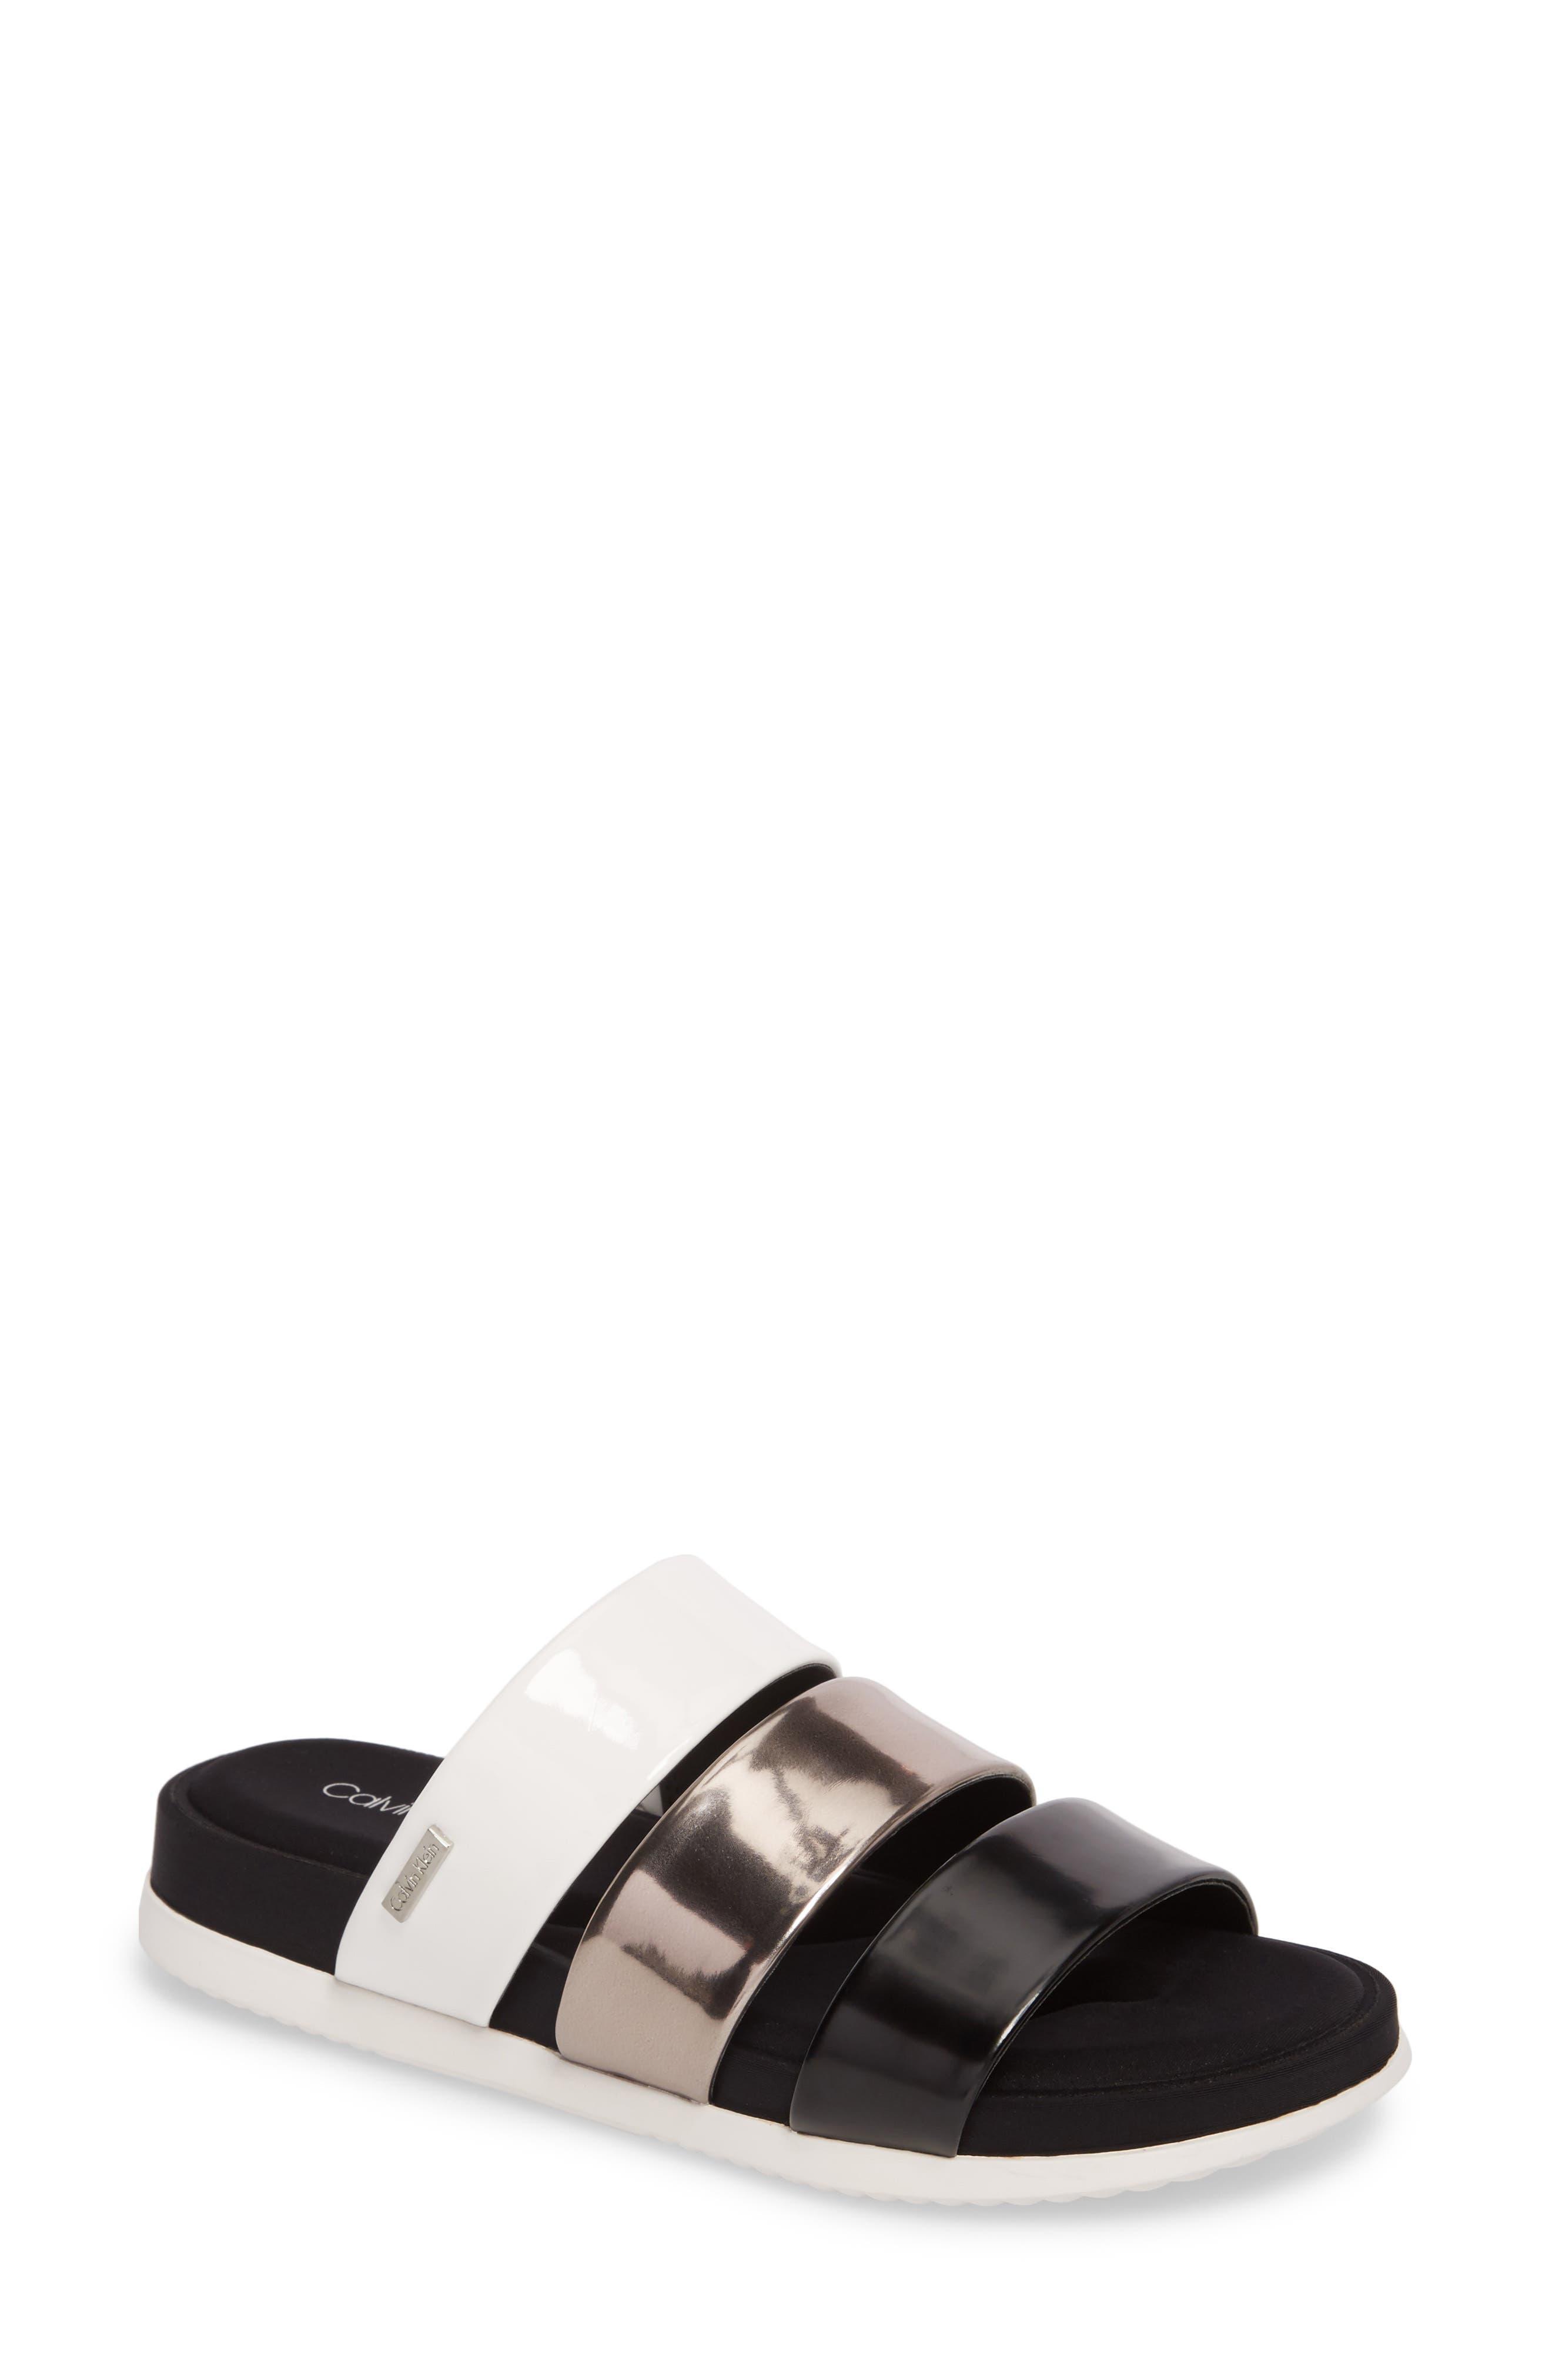 Dalana Slide Sandal,                         Main,                         color, Black/ Pewter Faux Leather